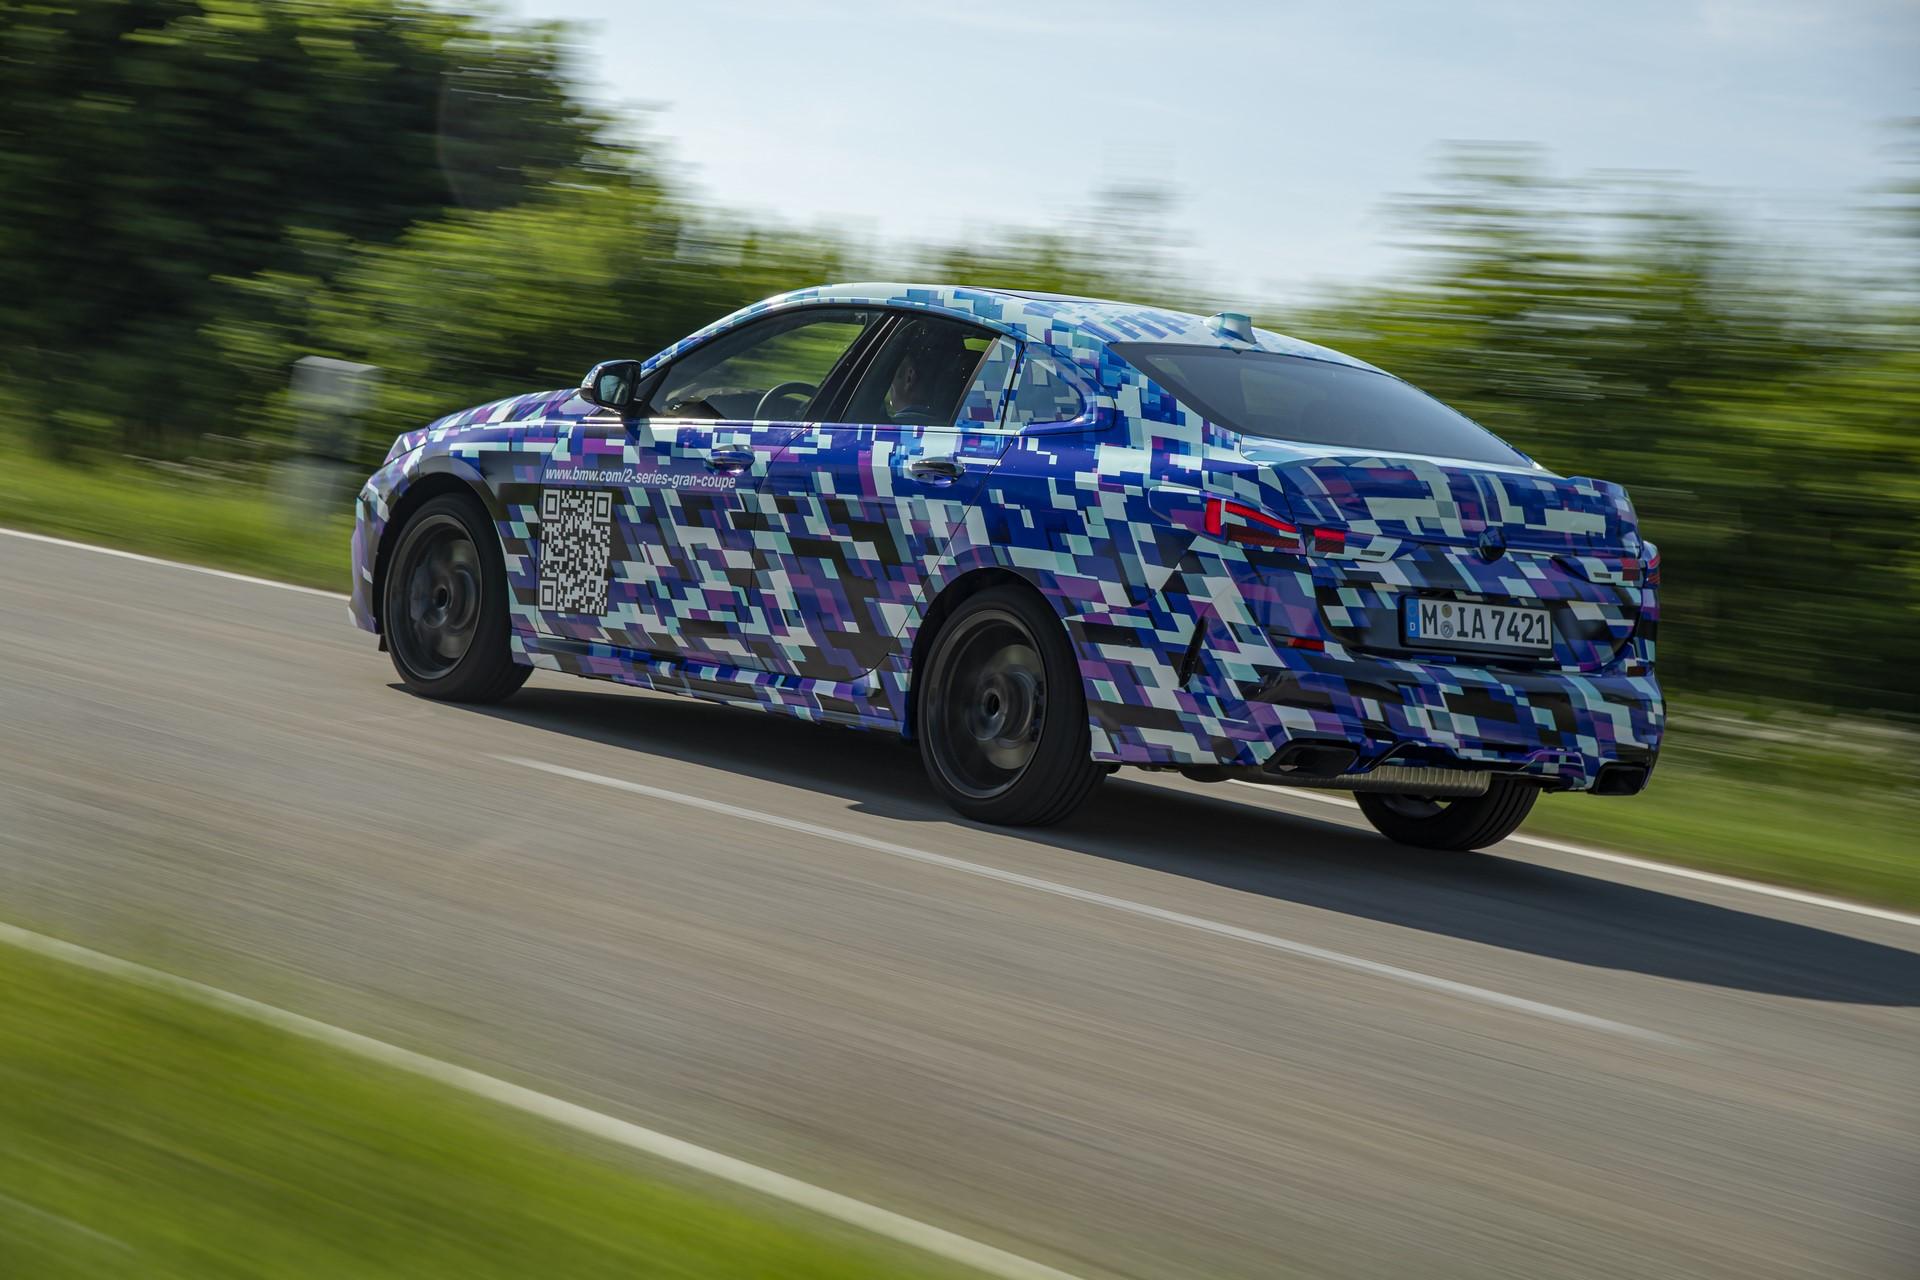 BMW-2-Series-Gran-Coupe-2020-spy-photos-30